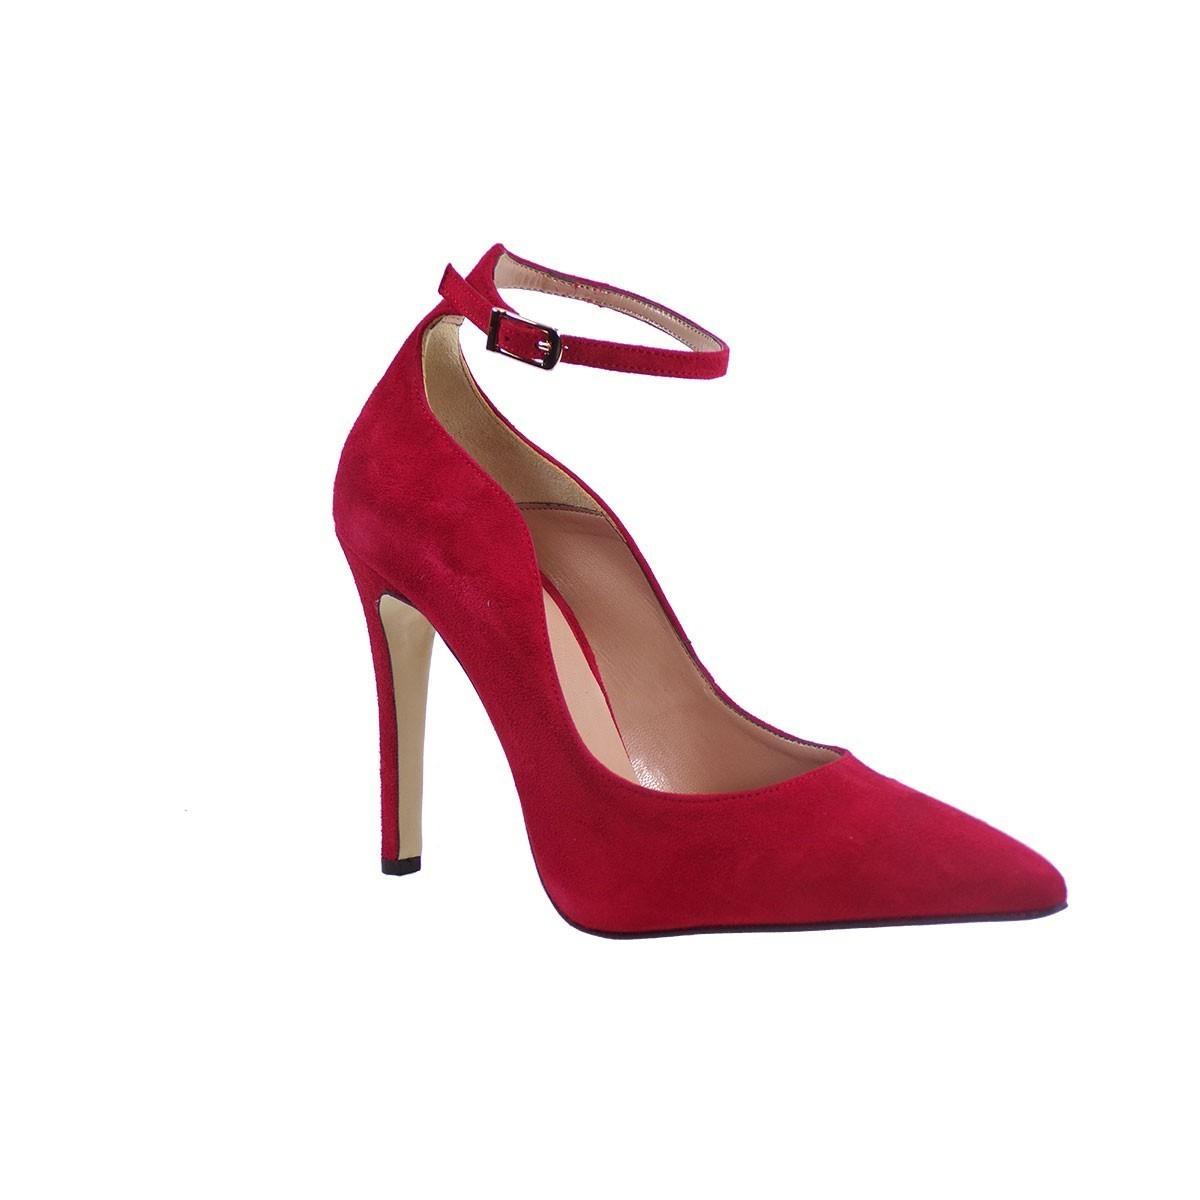 Fardoulis Shoes Γυναικείες Γόβες 02304 Kόκκινο Δέρμα Καστόρι